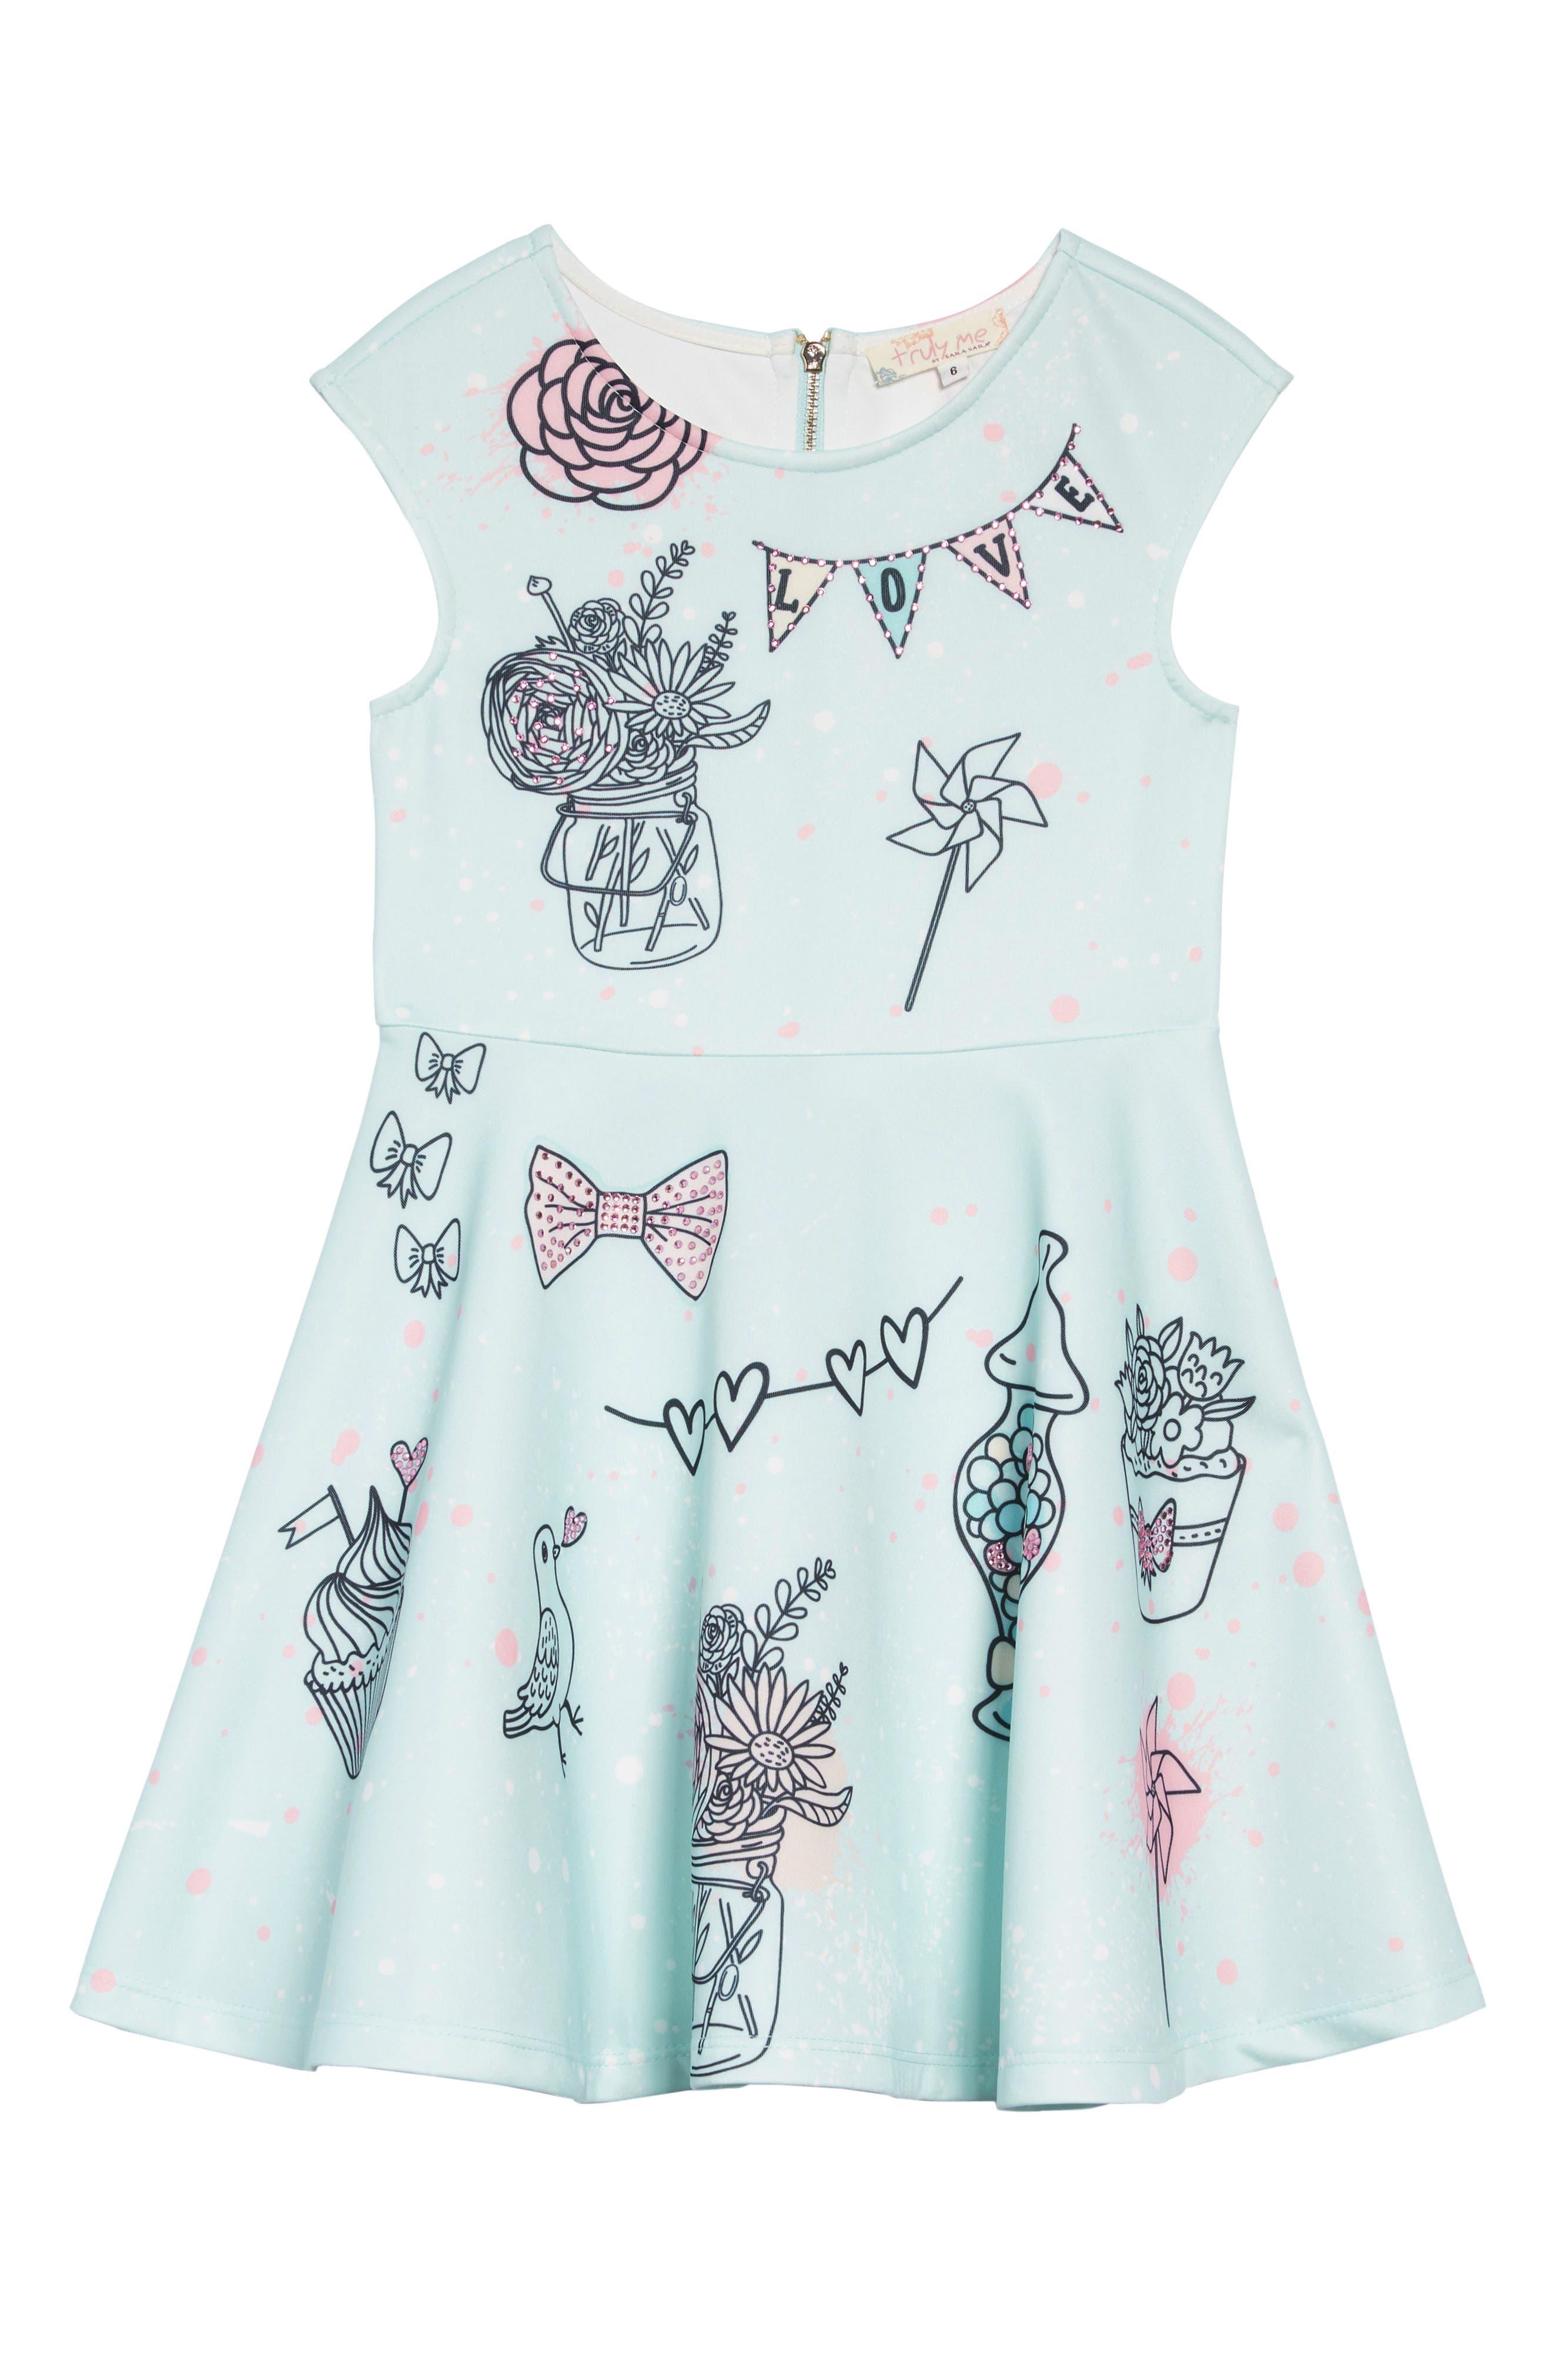 Whimsy Embellished Fit & Flare Dress, Main, color, AQUA MULTI